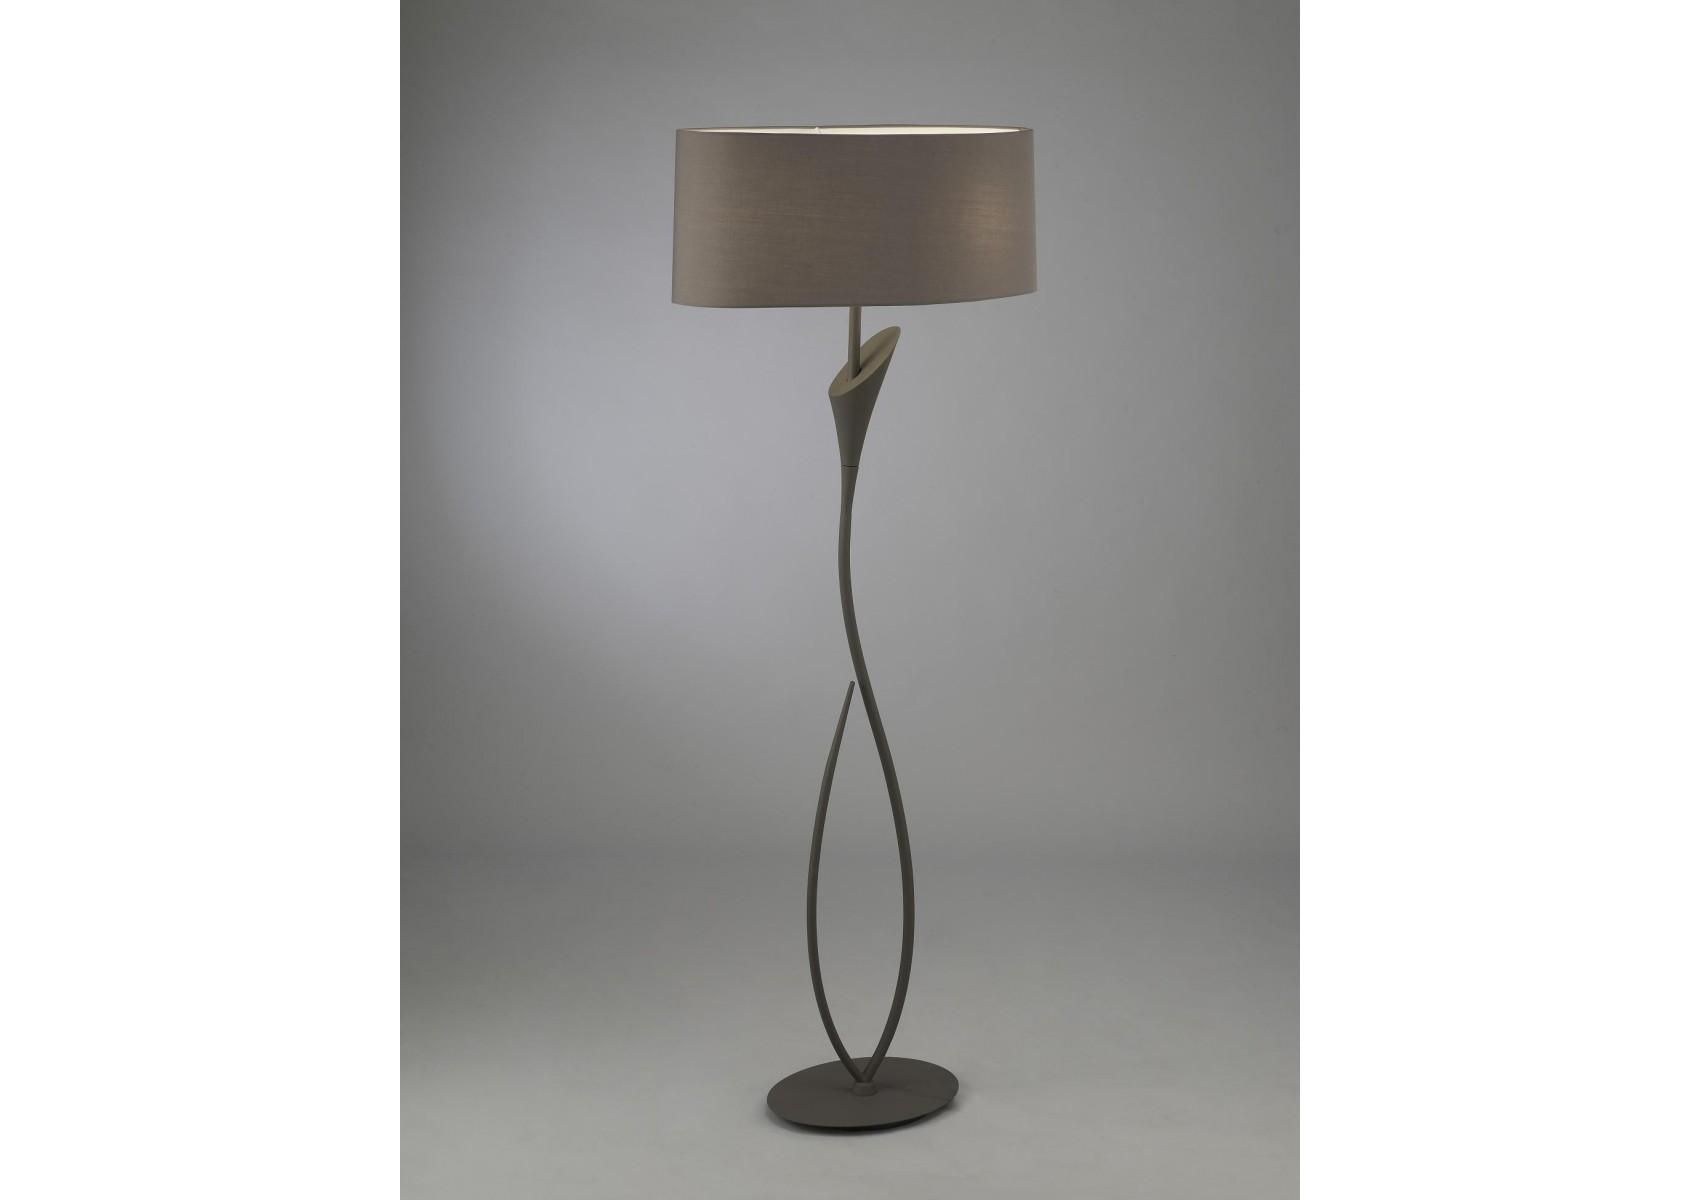 lampadaire design lua 2l mantra boite design. Black Bedroom Furniture Sets. Home Design Ideas